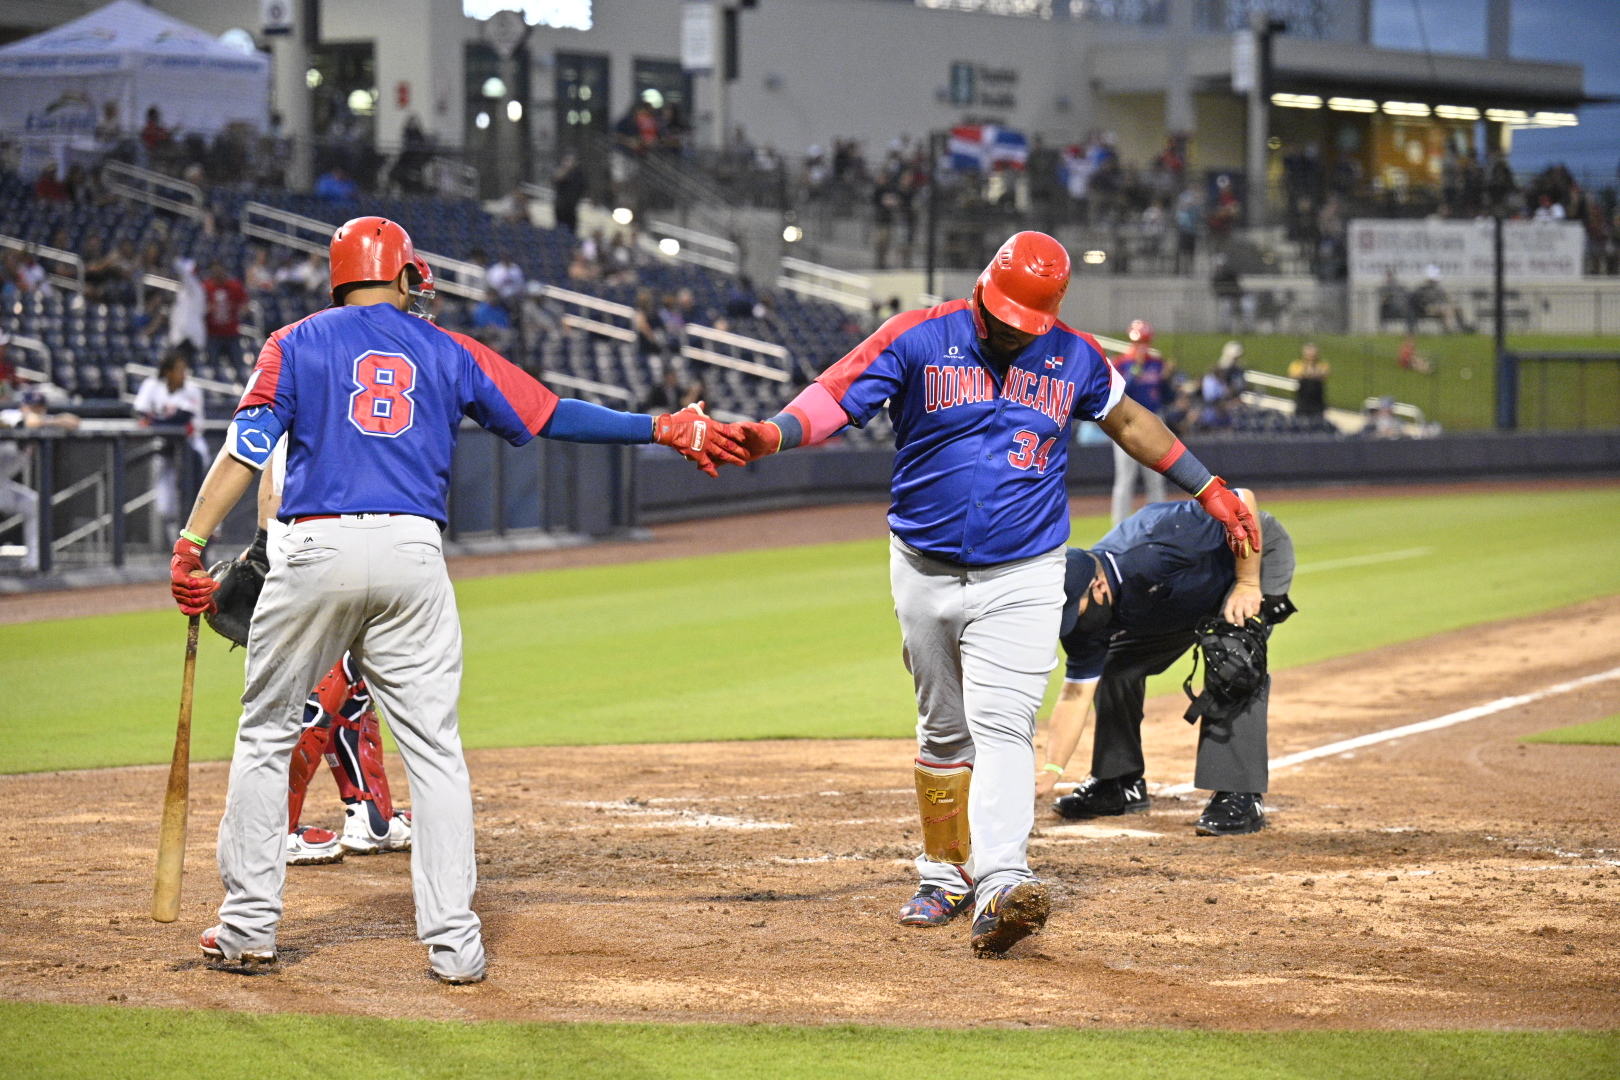 Dominicana cae ante Estados Unidos; debe vencer a Nicaragua para avanzar